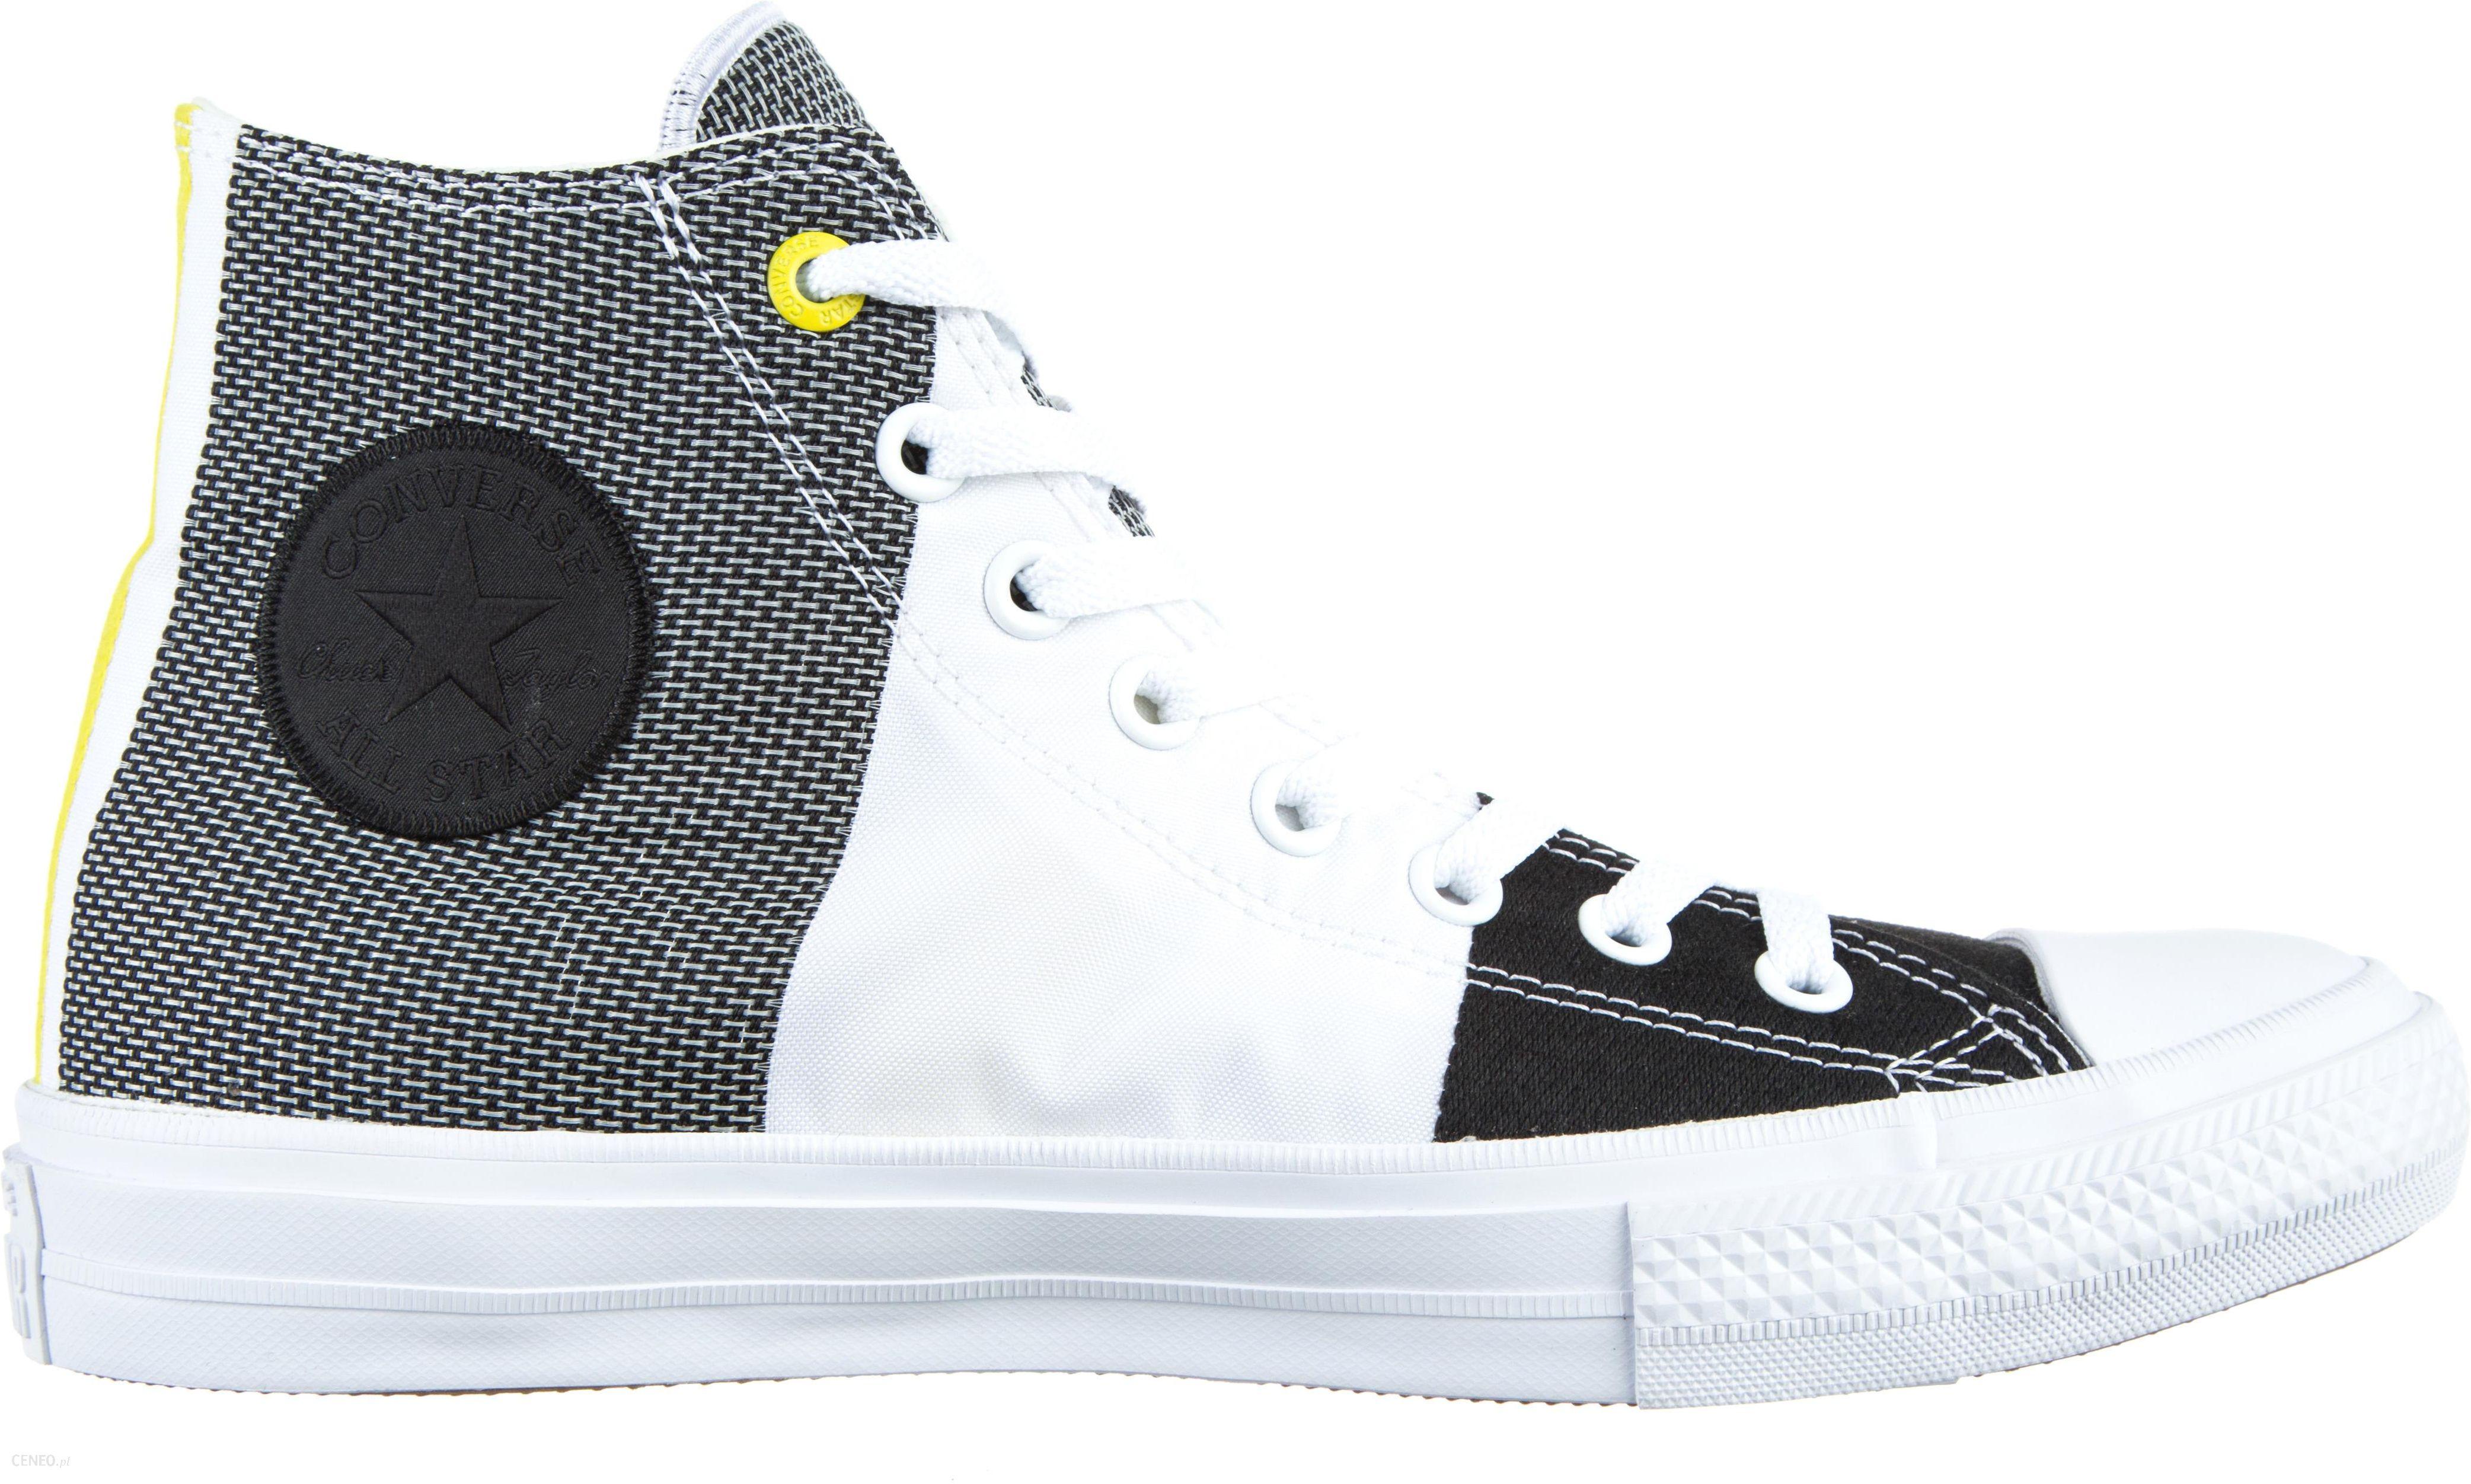 Converse Chuck Taylor All Star II Tenisówki Czarny Żółty Biały 42